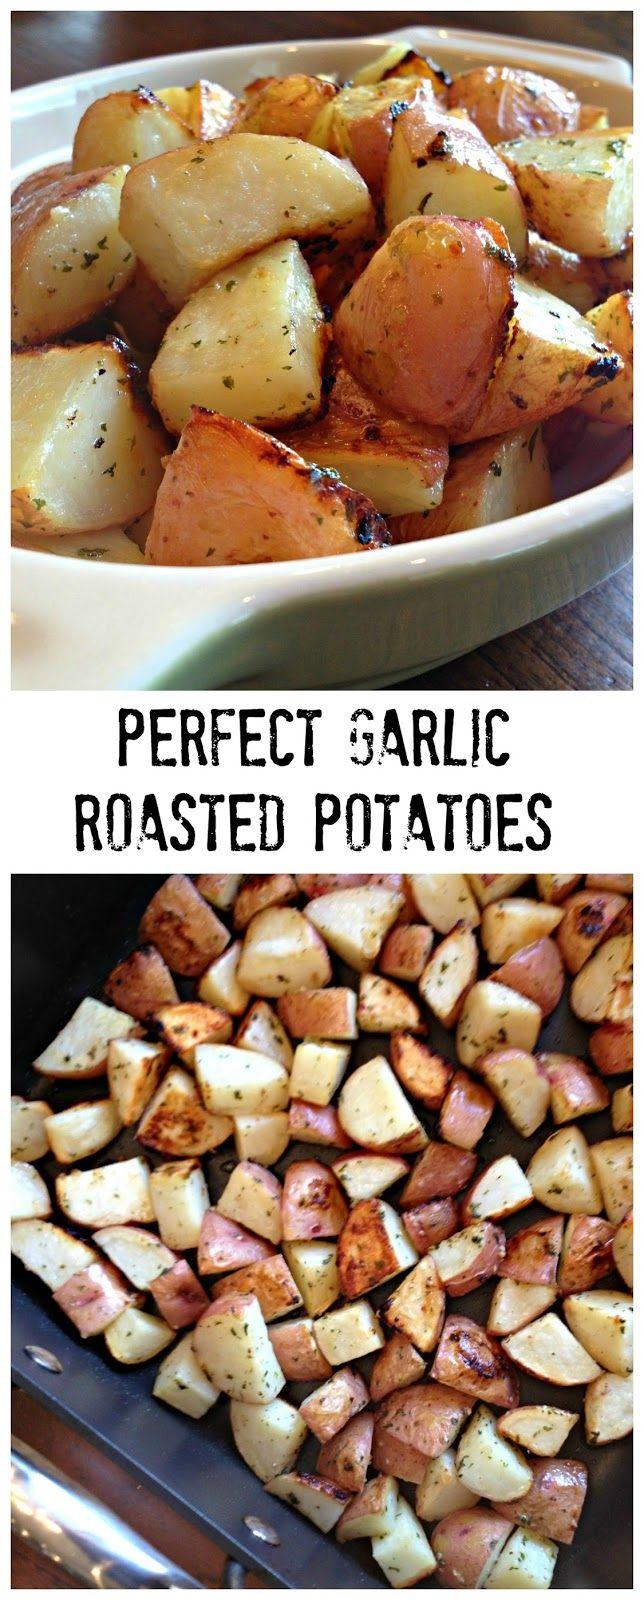 http://www.sweetlittlebluebird.com/2015/06/perfect-garlic-roasted-potatoes.html